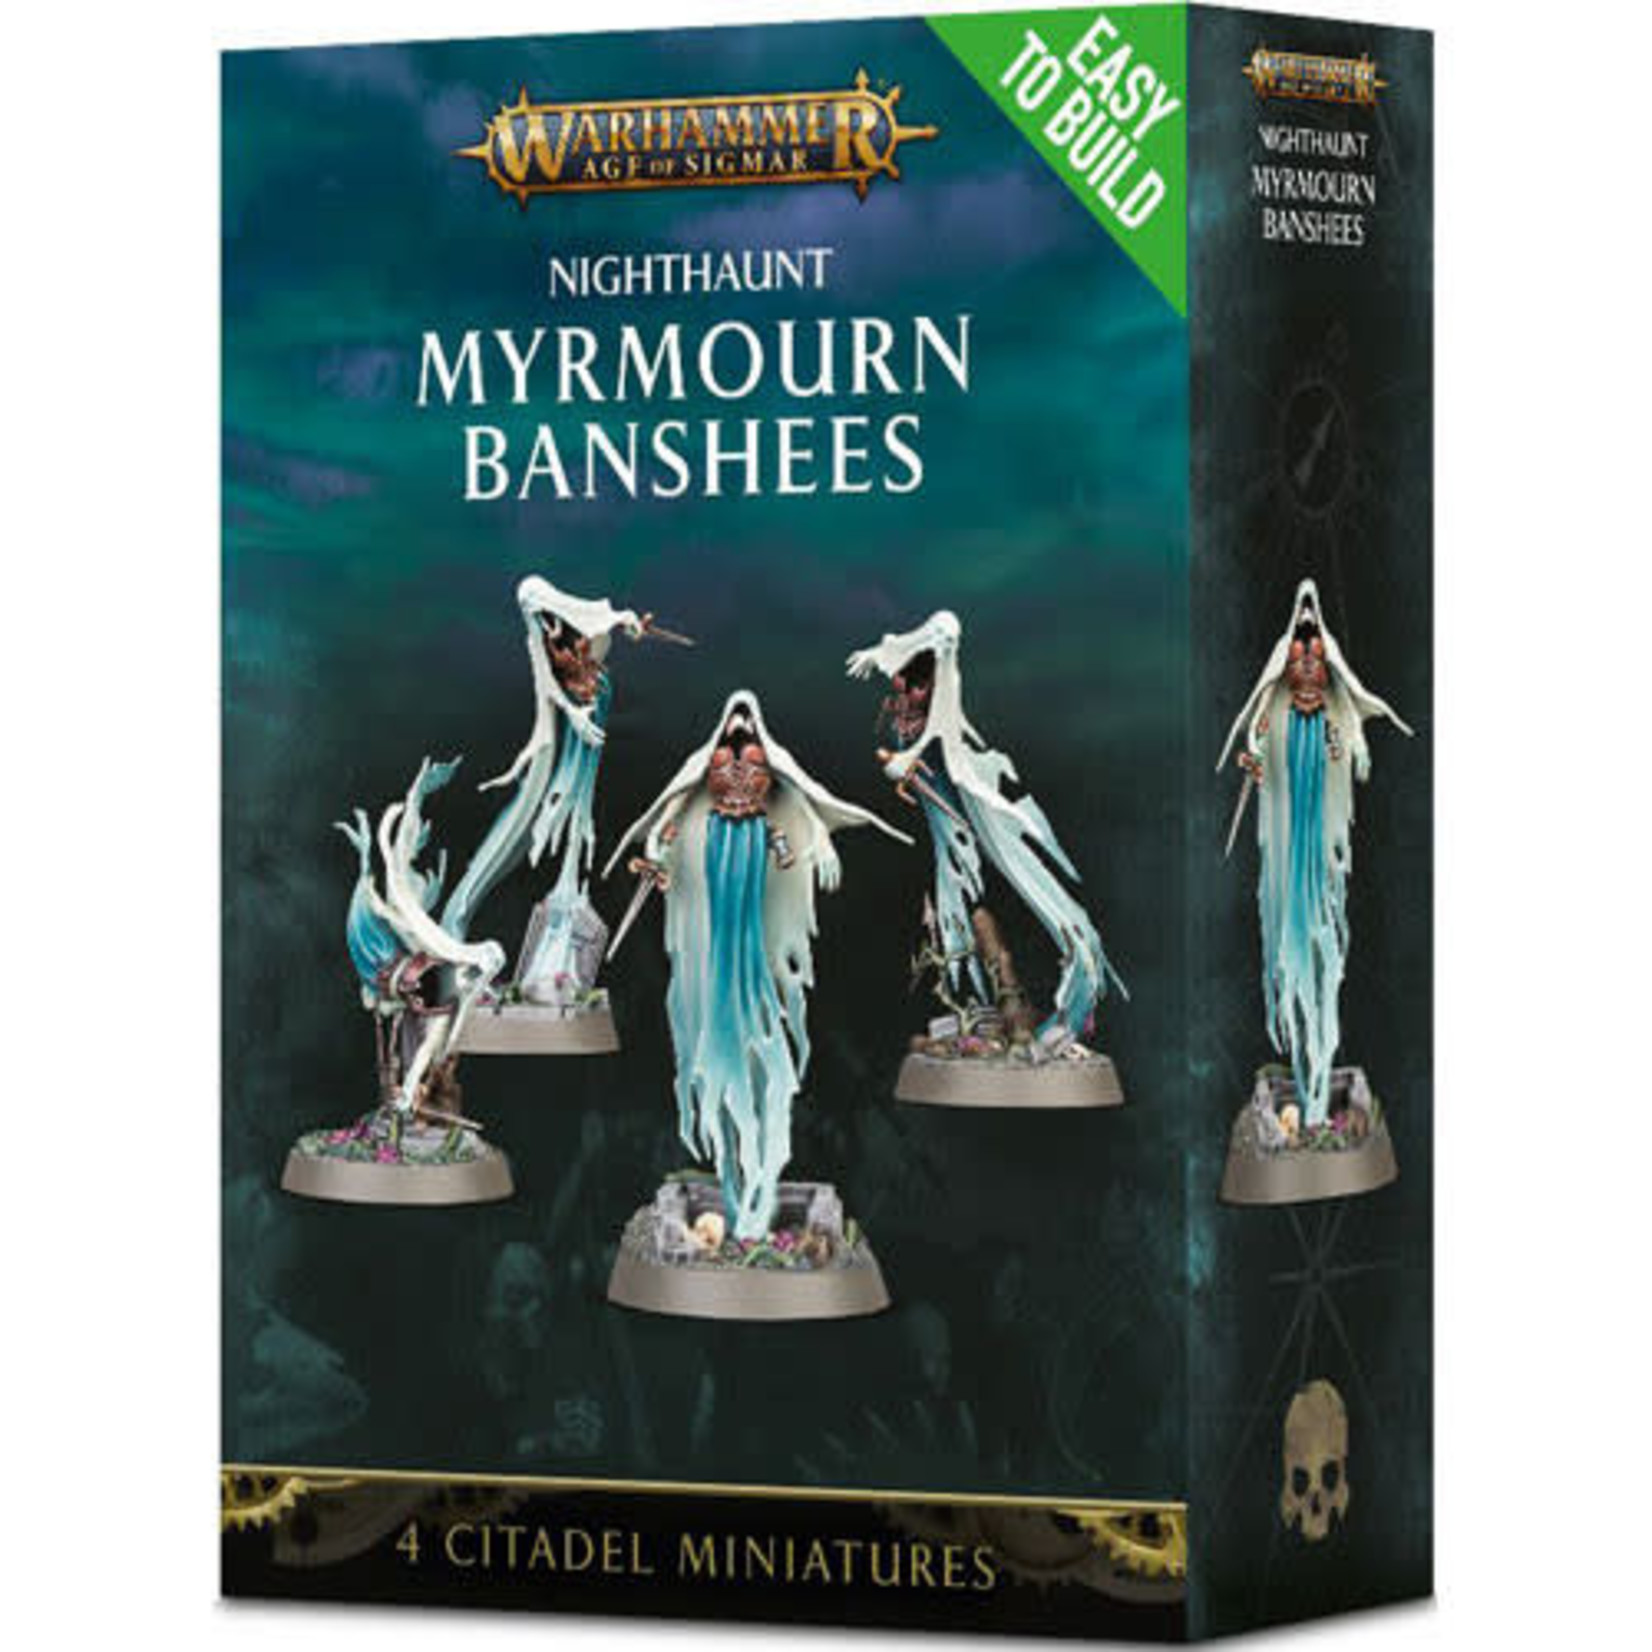 Games Workshop Warhammer Age of Sigmar: Nighthaunt Myrmourn Banshees (Easy-to-Build)